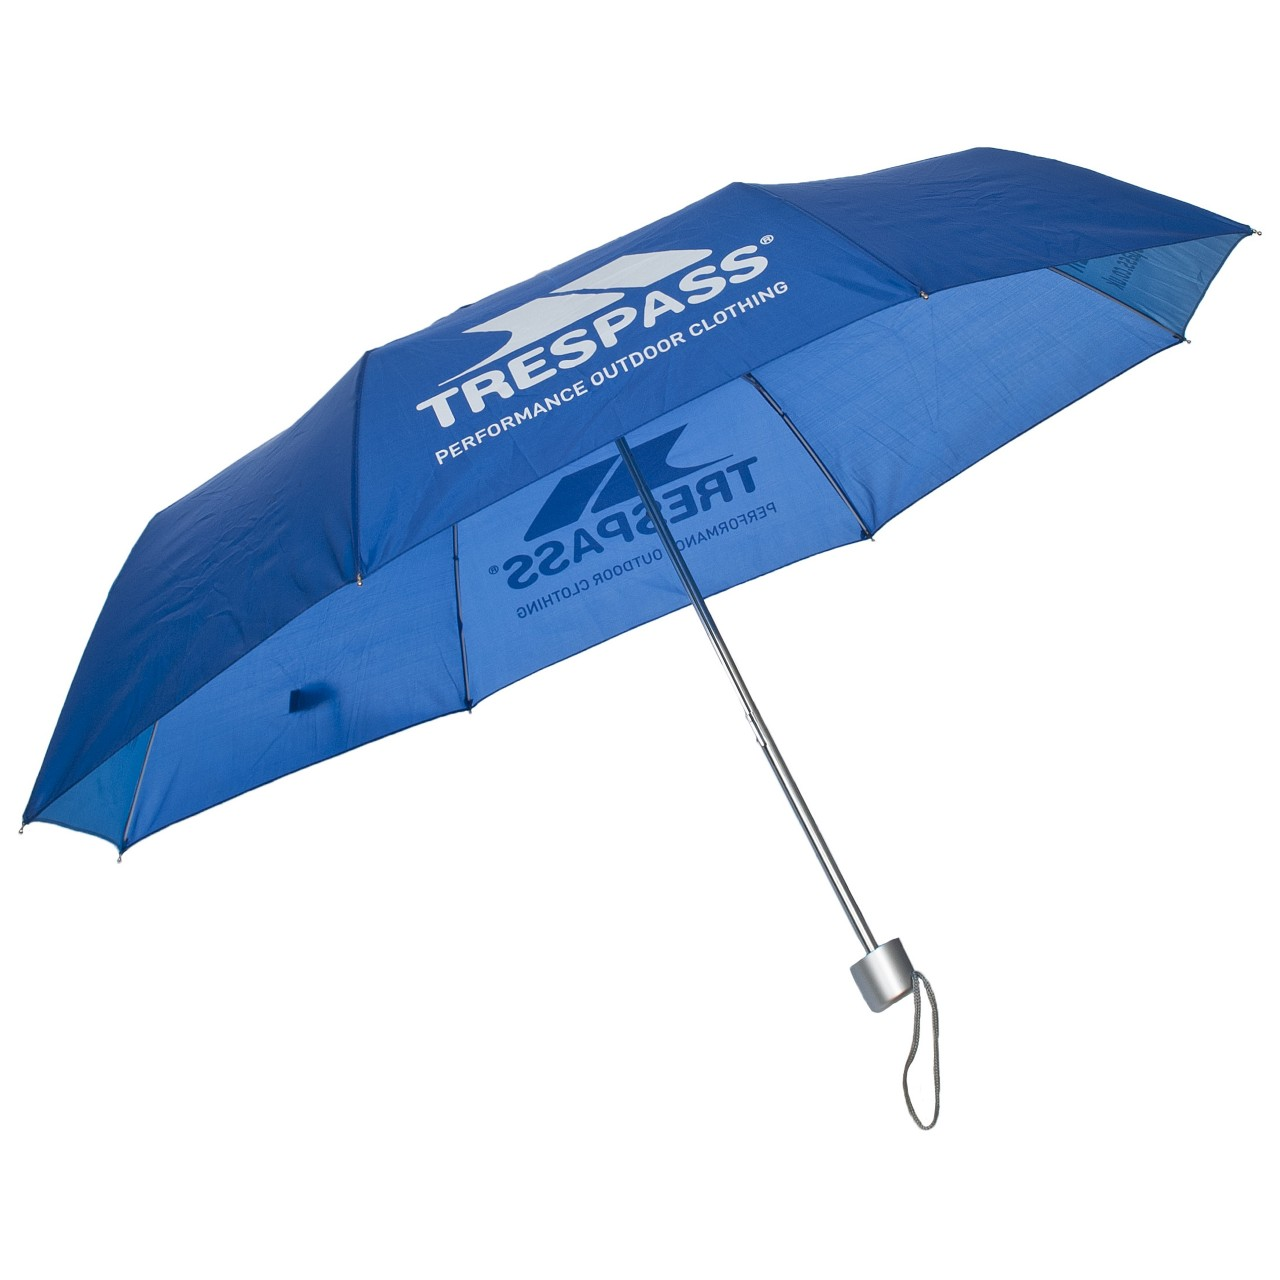 Billede af Trespass Compact Paraply Blå